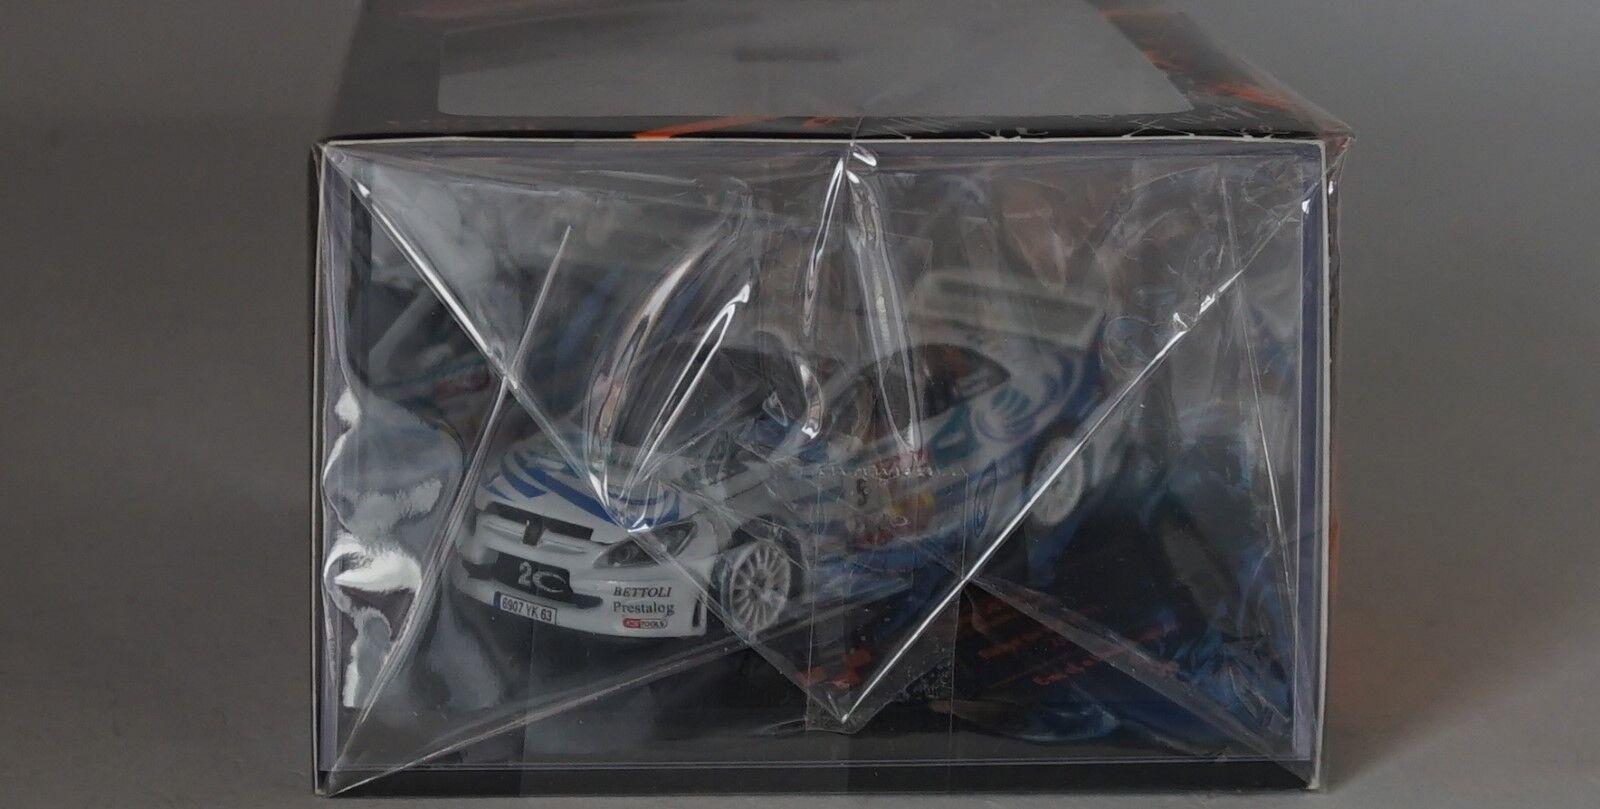 Vitesse 43045 Peugeot 307 WRC  5 Sarrazin - Renucci Rally Du Var 2011 1 43